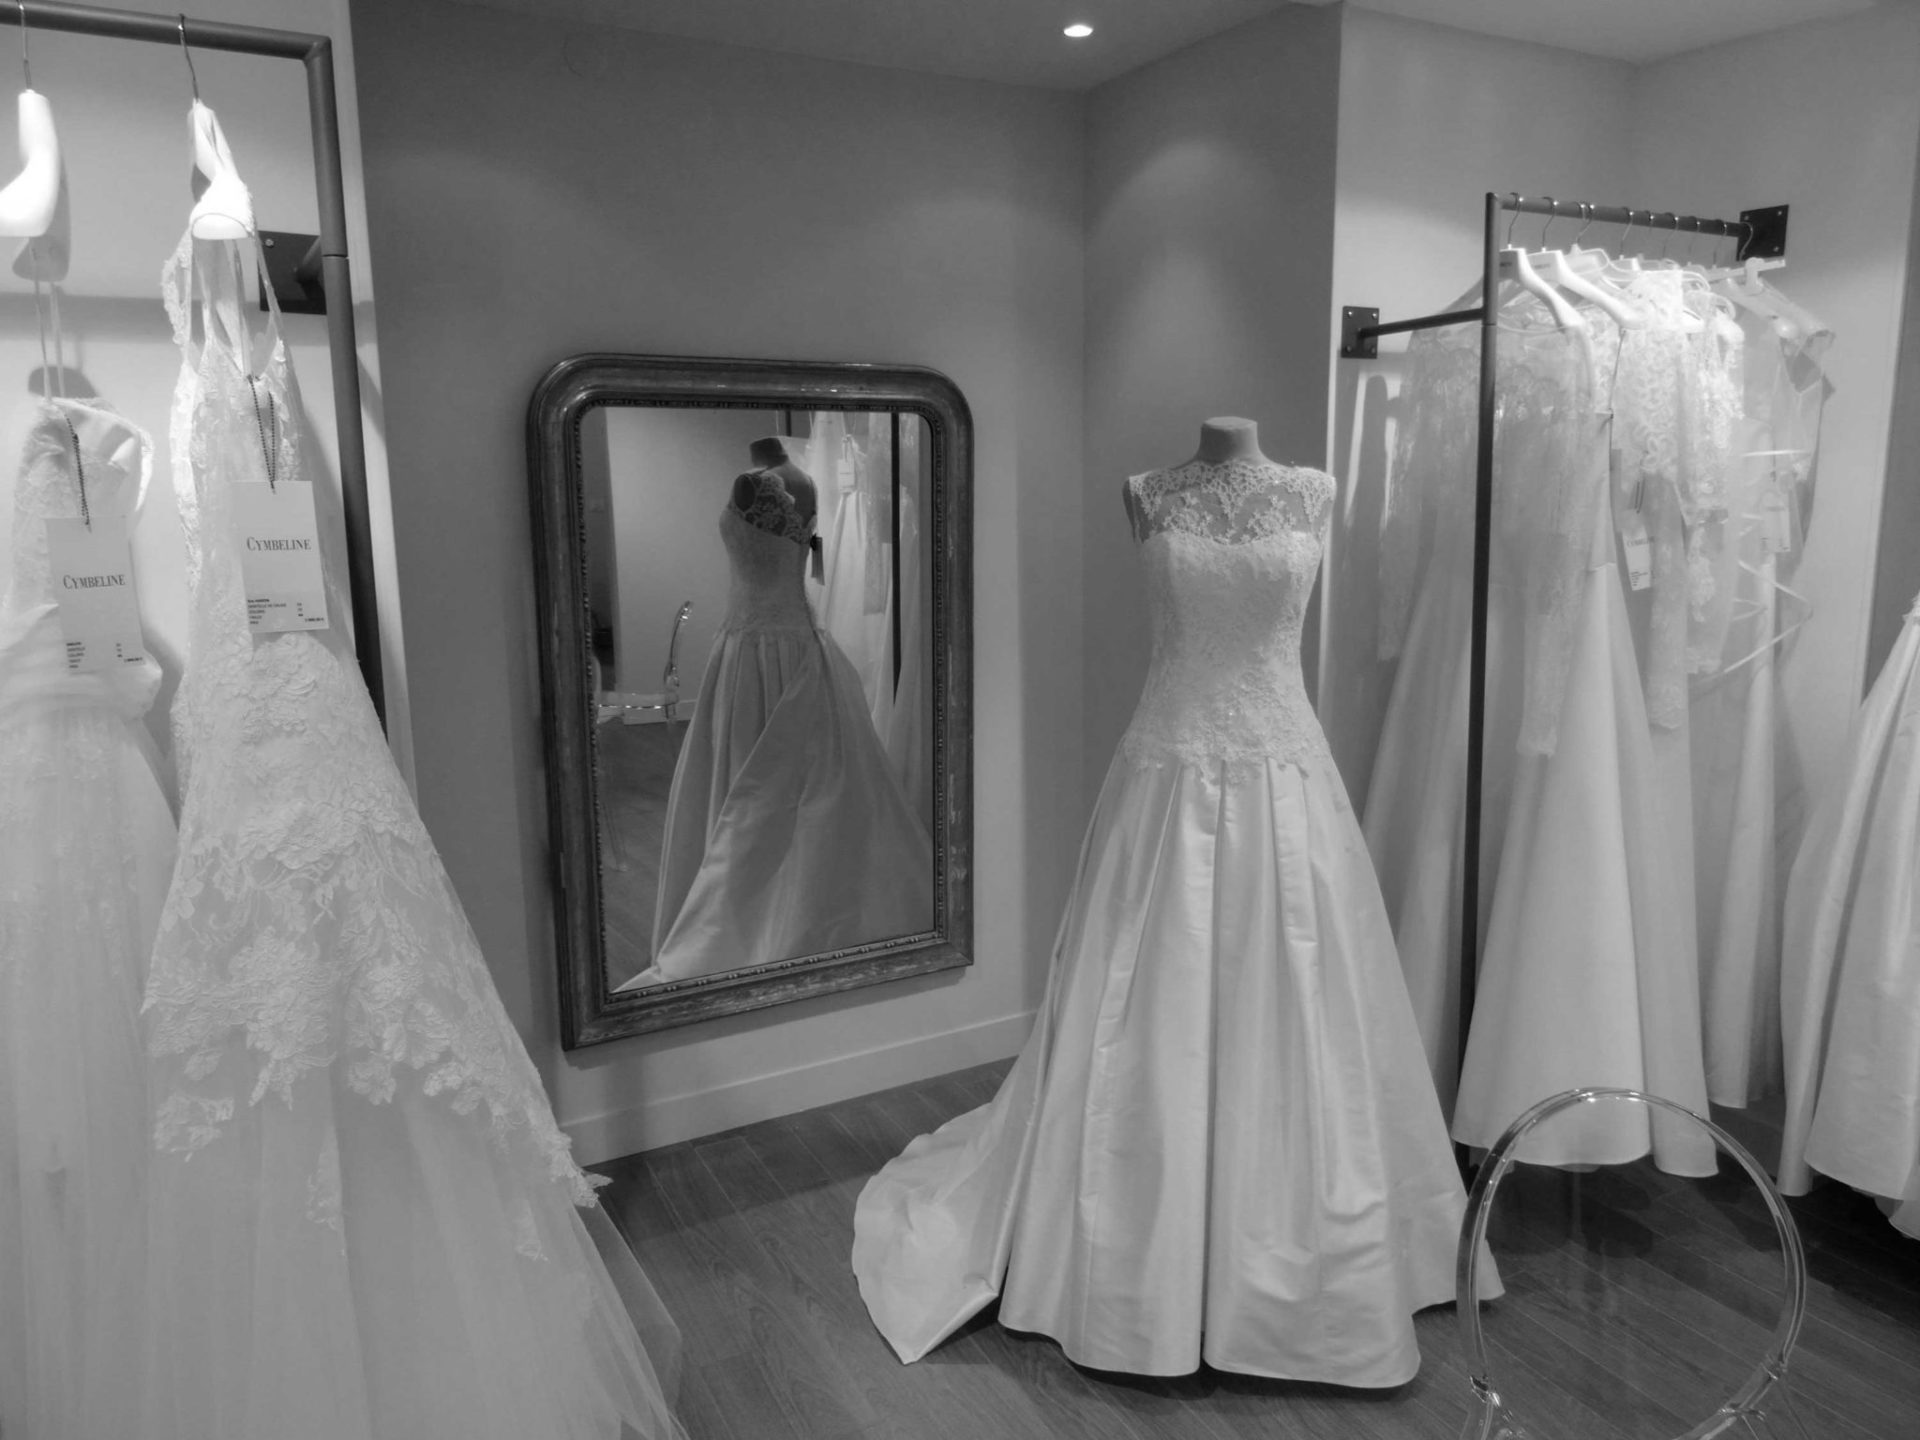 Boutique Cymbeline - Robes de mariée wedding dresses abiti de sposa vestidos de noiva Hochzeitskleid